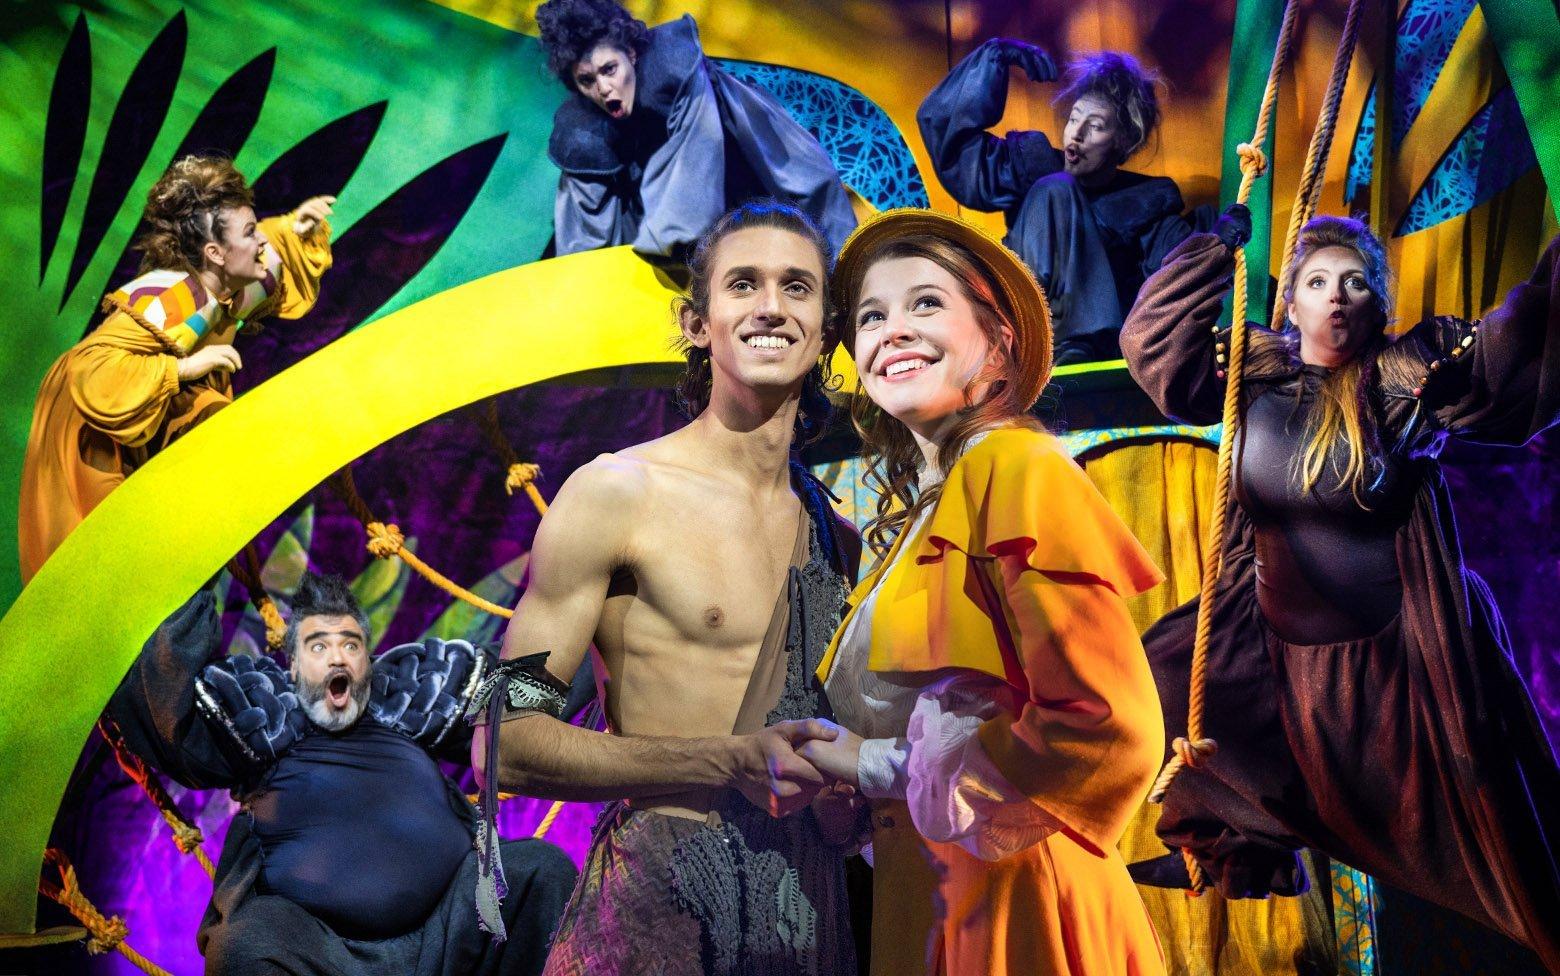 Tarzan_-_das_Musical_Theater_Liberi_Galerie-1_1560x976px.jpg